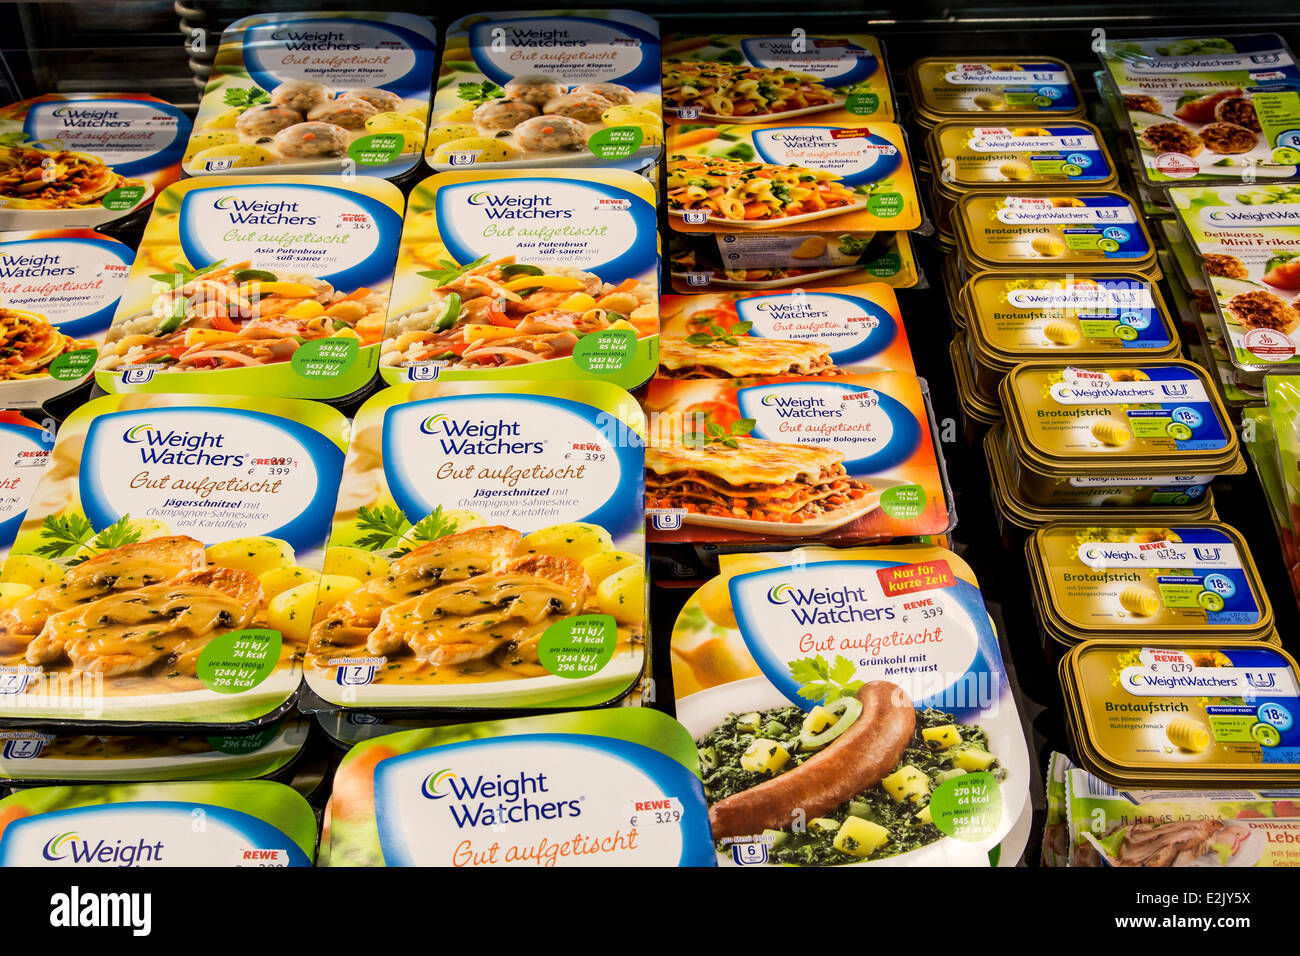 Where Buy Weight Watchers Food